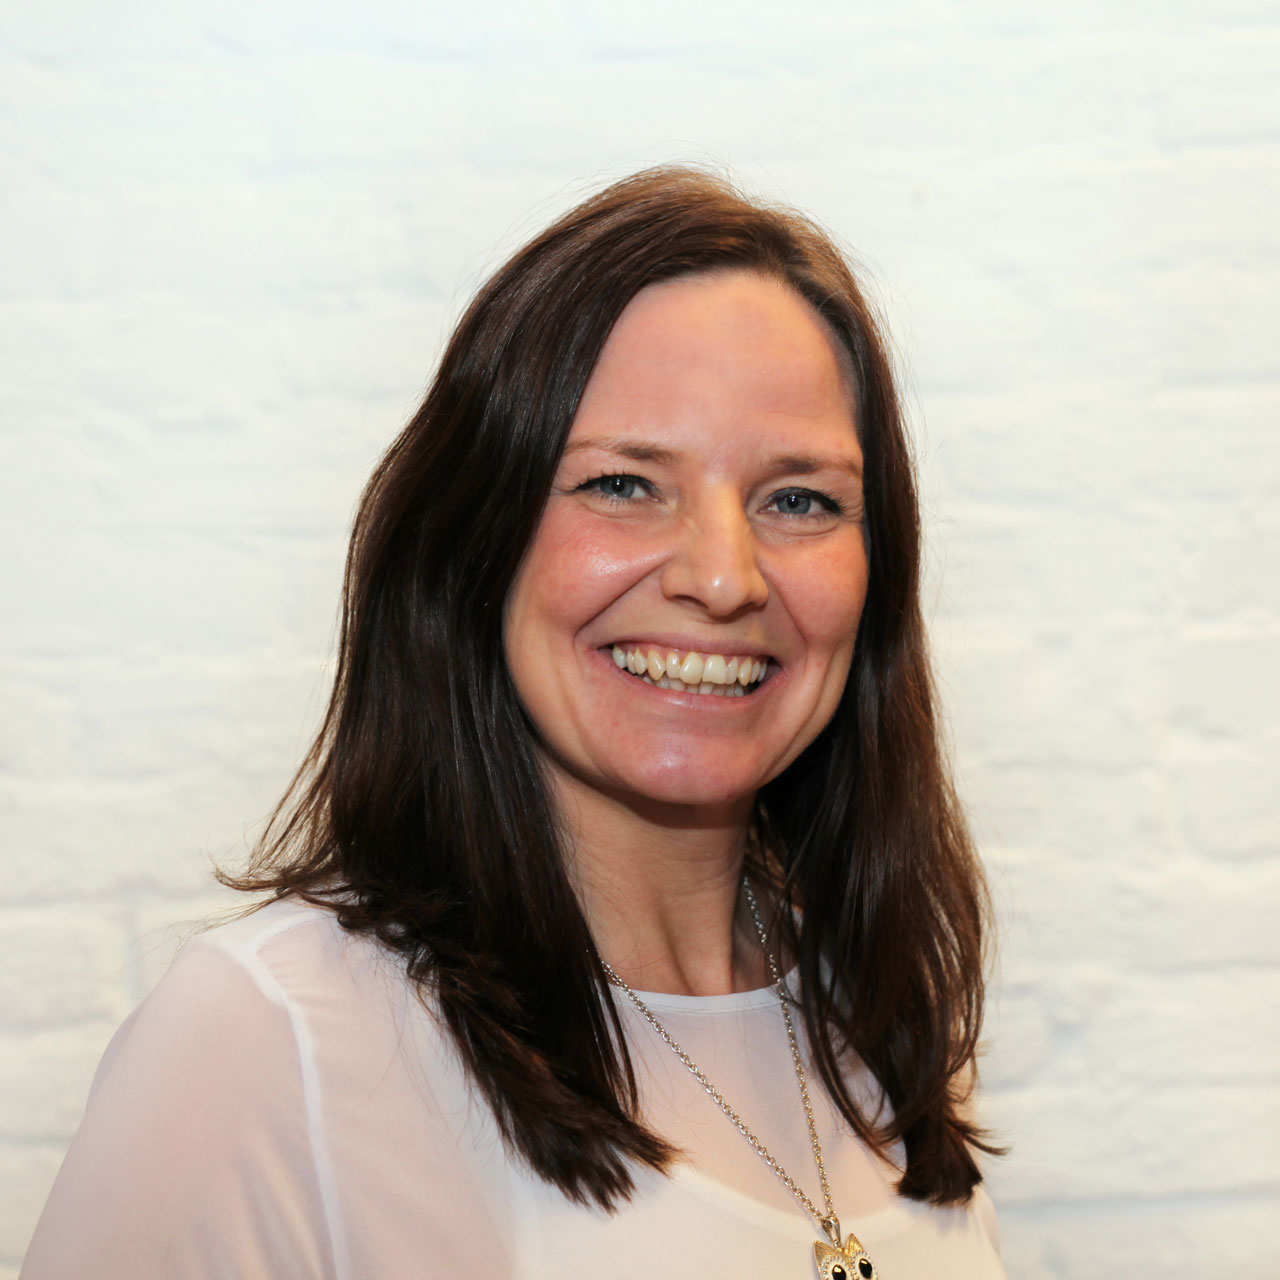 Anne Tøndel smiler